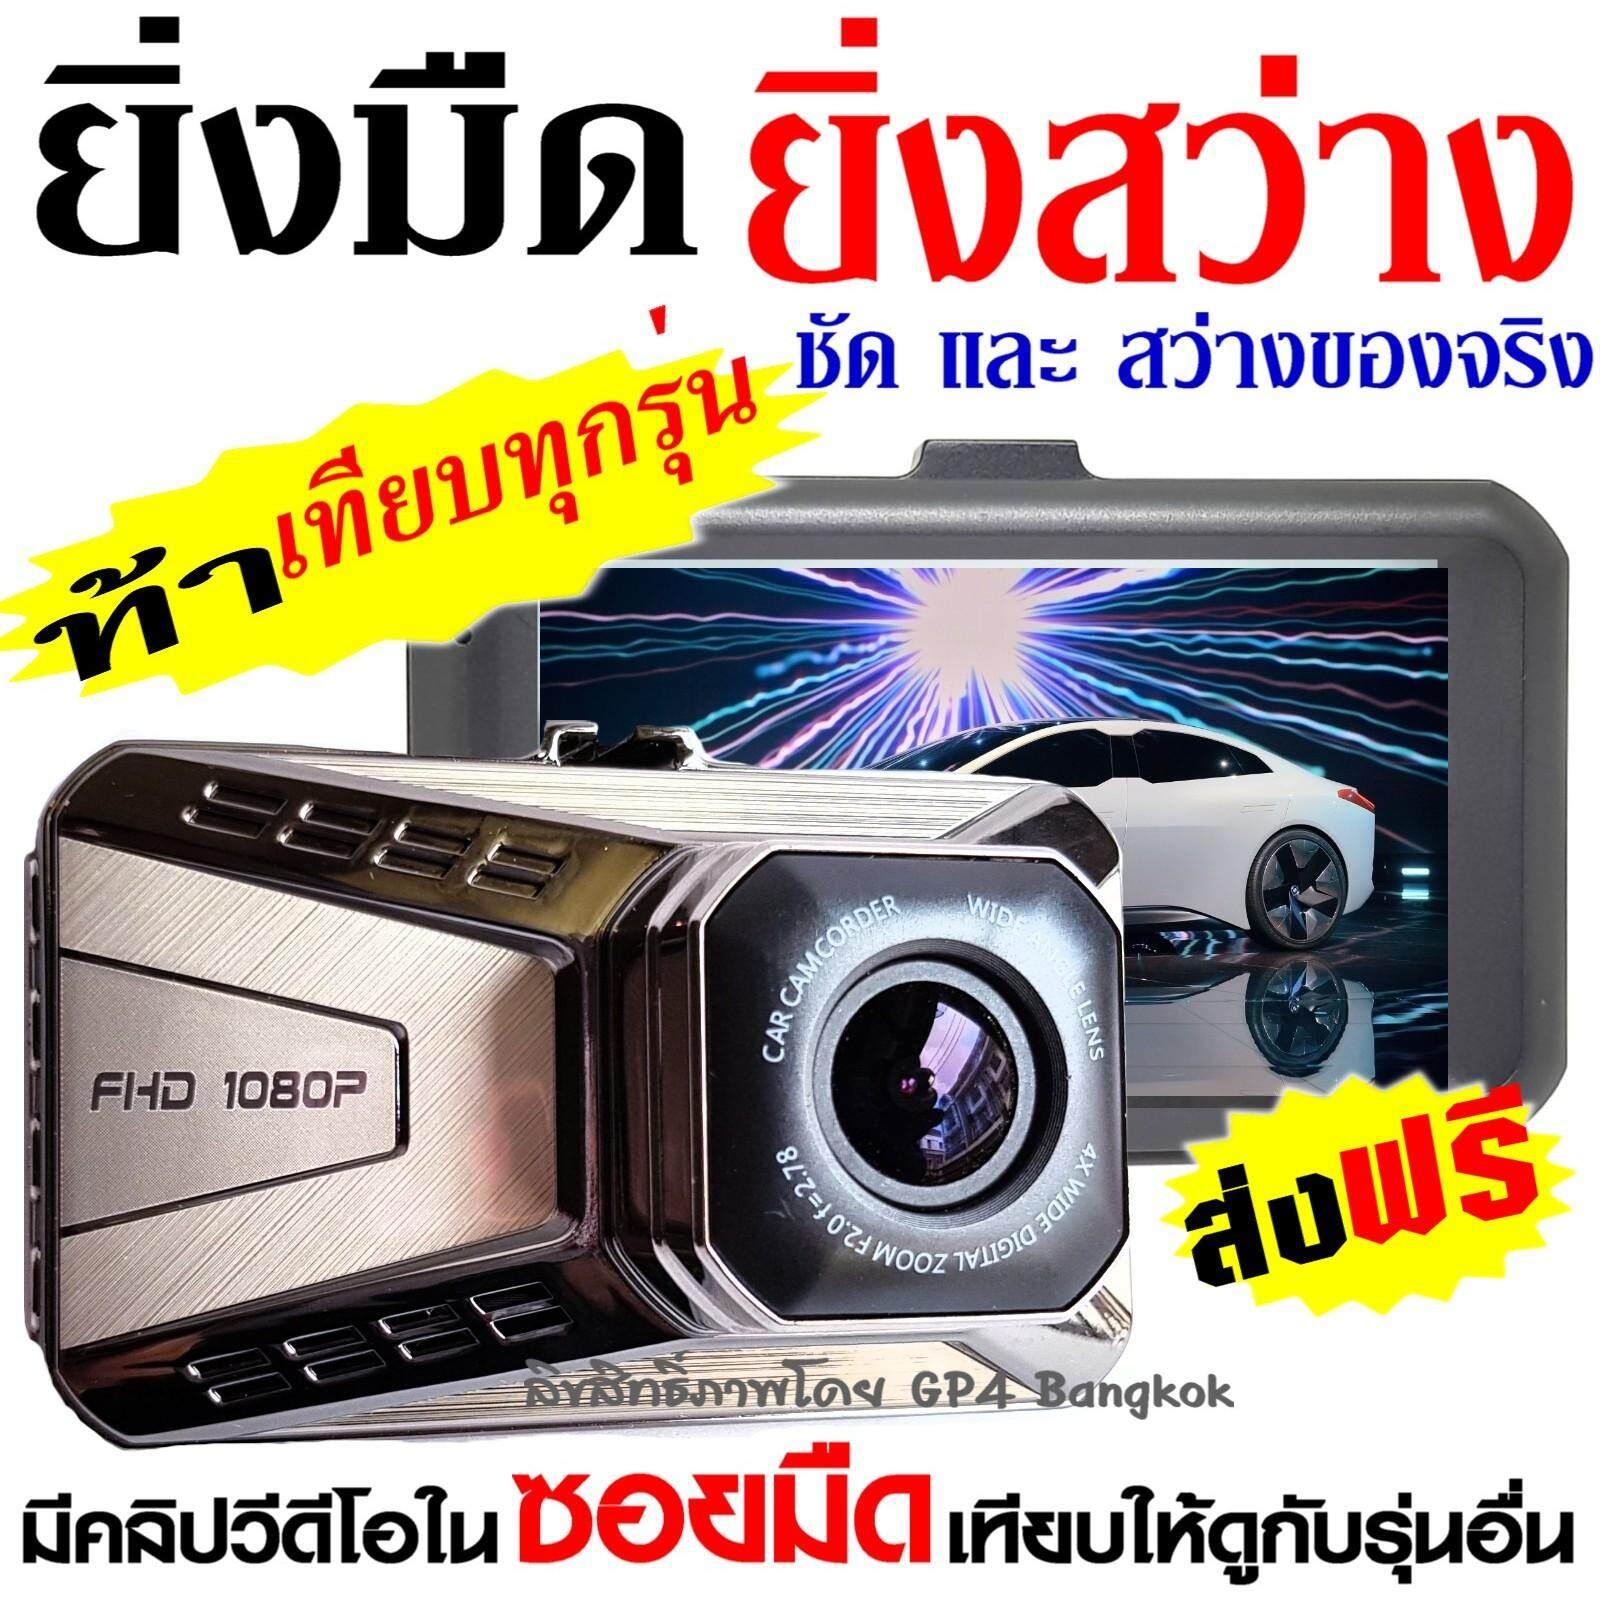 T990se กล้องติดรถยนต์ กลางคืนสว่างที่สุด Wdr + Super Night Vision + Ldws (เตือนออกนอกเลนส์) +fcws (เตือนรถใกล้คันหน้าเกินไป) + Parking Monitor บอดี้โลหะ จอใหญ่ 3.0นิ้ว Fhd 1080p เมนูไทย รุ่น T990se (silver)-มีคลิปวีดีโอในซอยมืดเปรียบเทียบกับรุ่นอื่นให้ดู By Gp4 Bangkok.